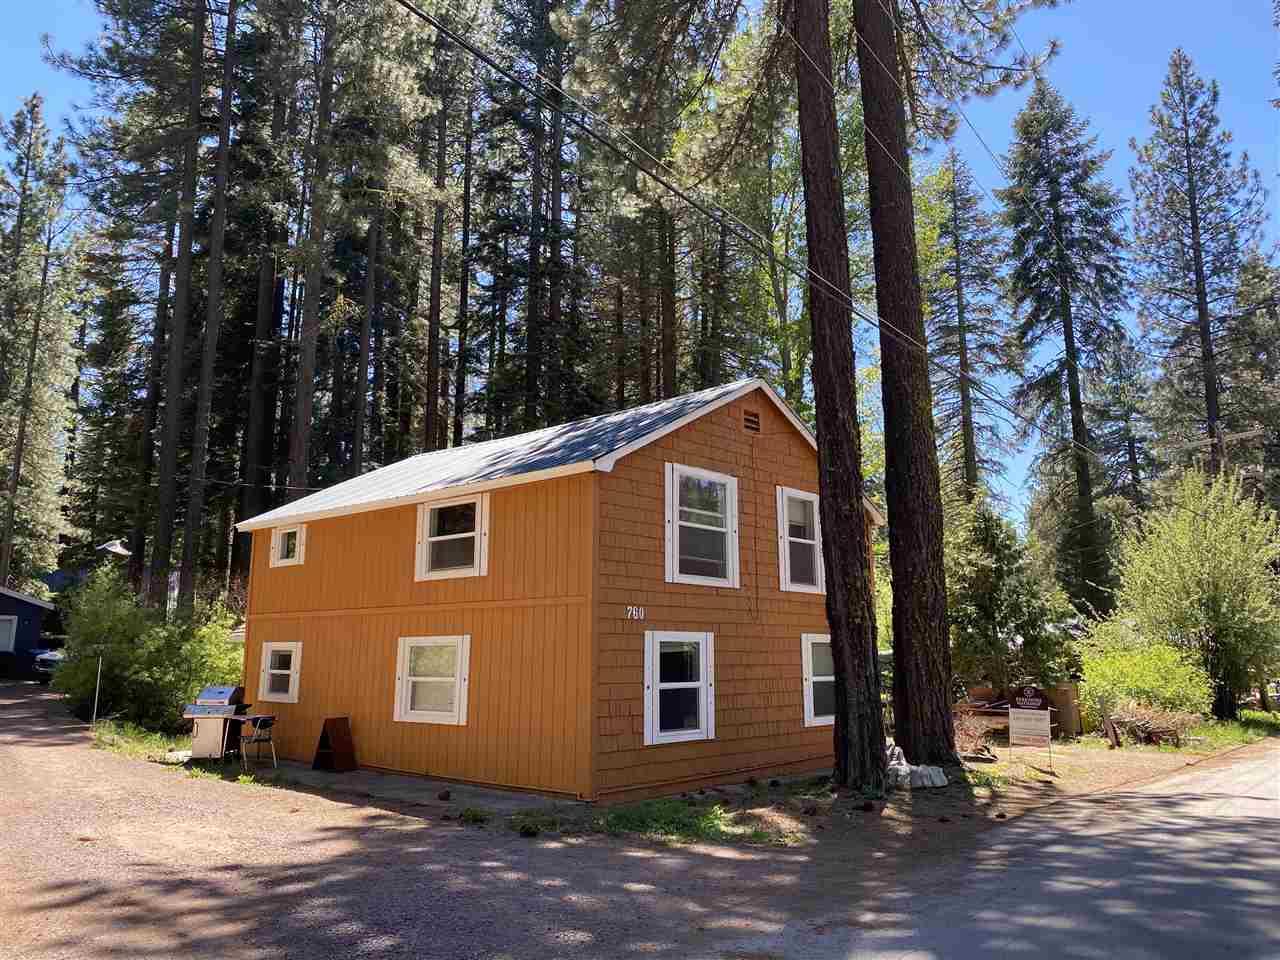 666-760 Spring Creek Drive, Clear Creek, CA 96137